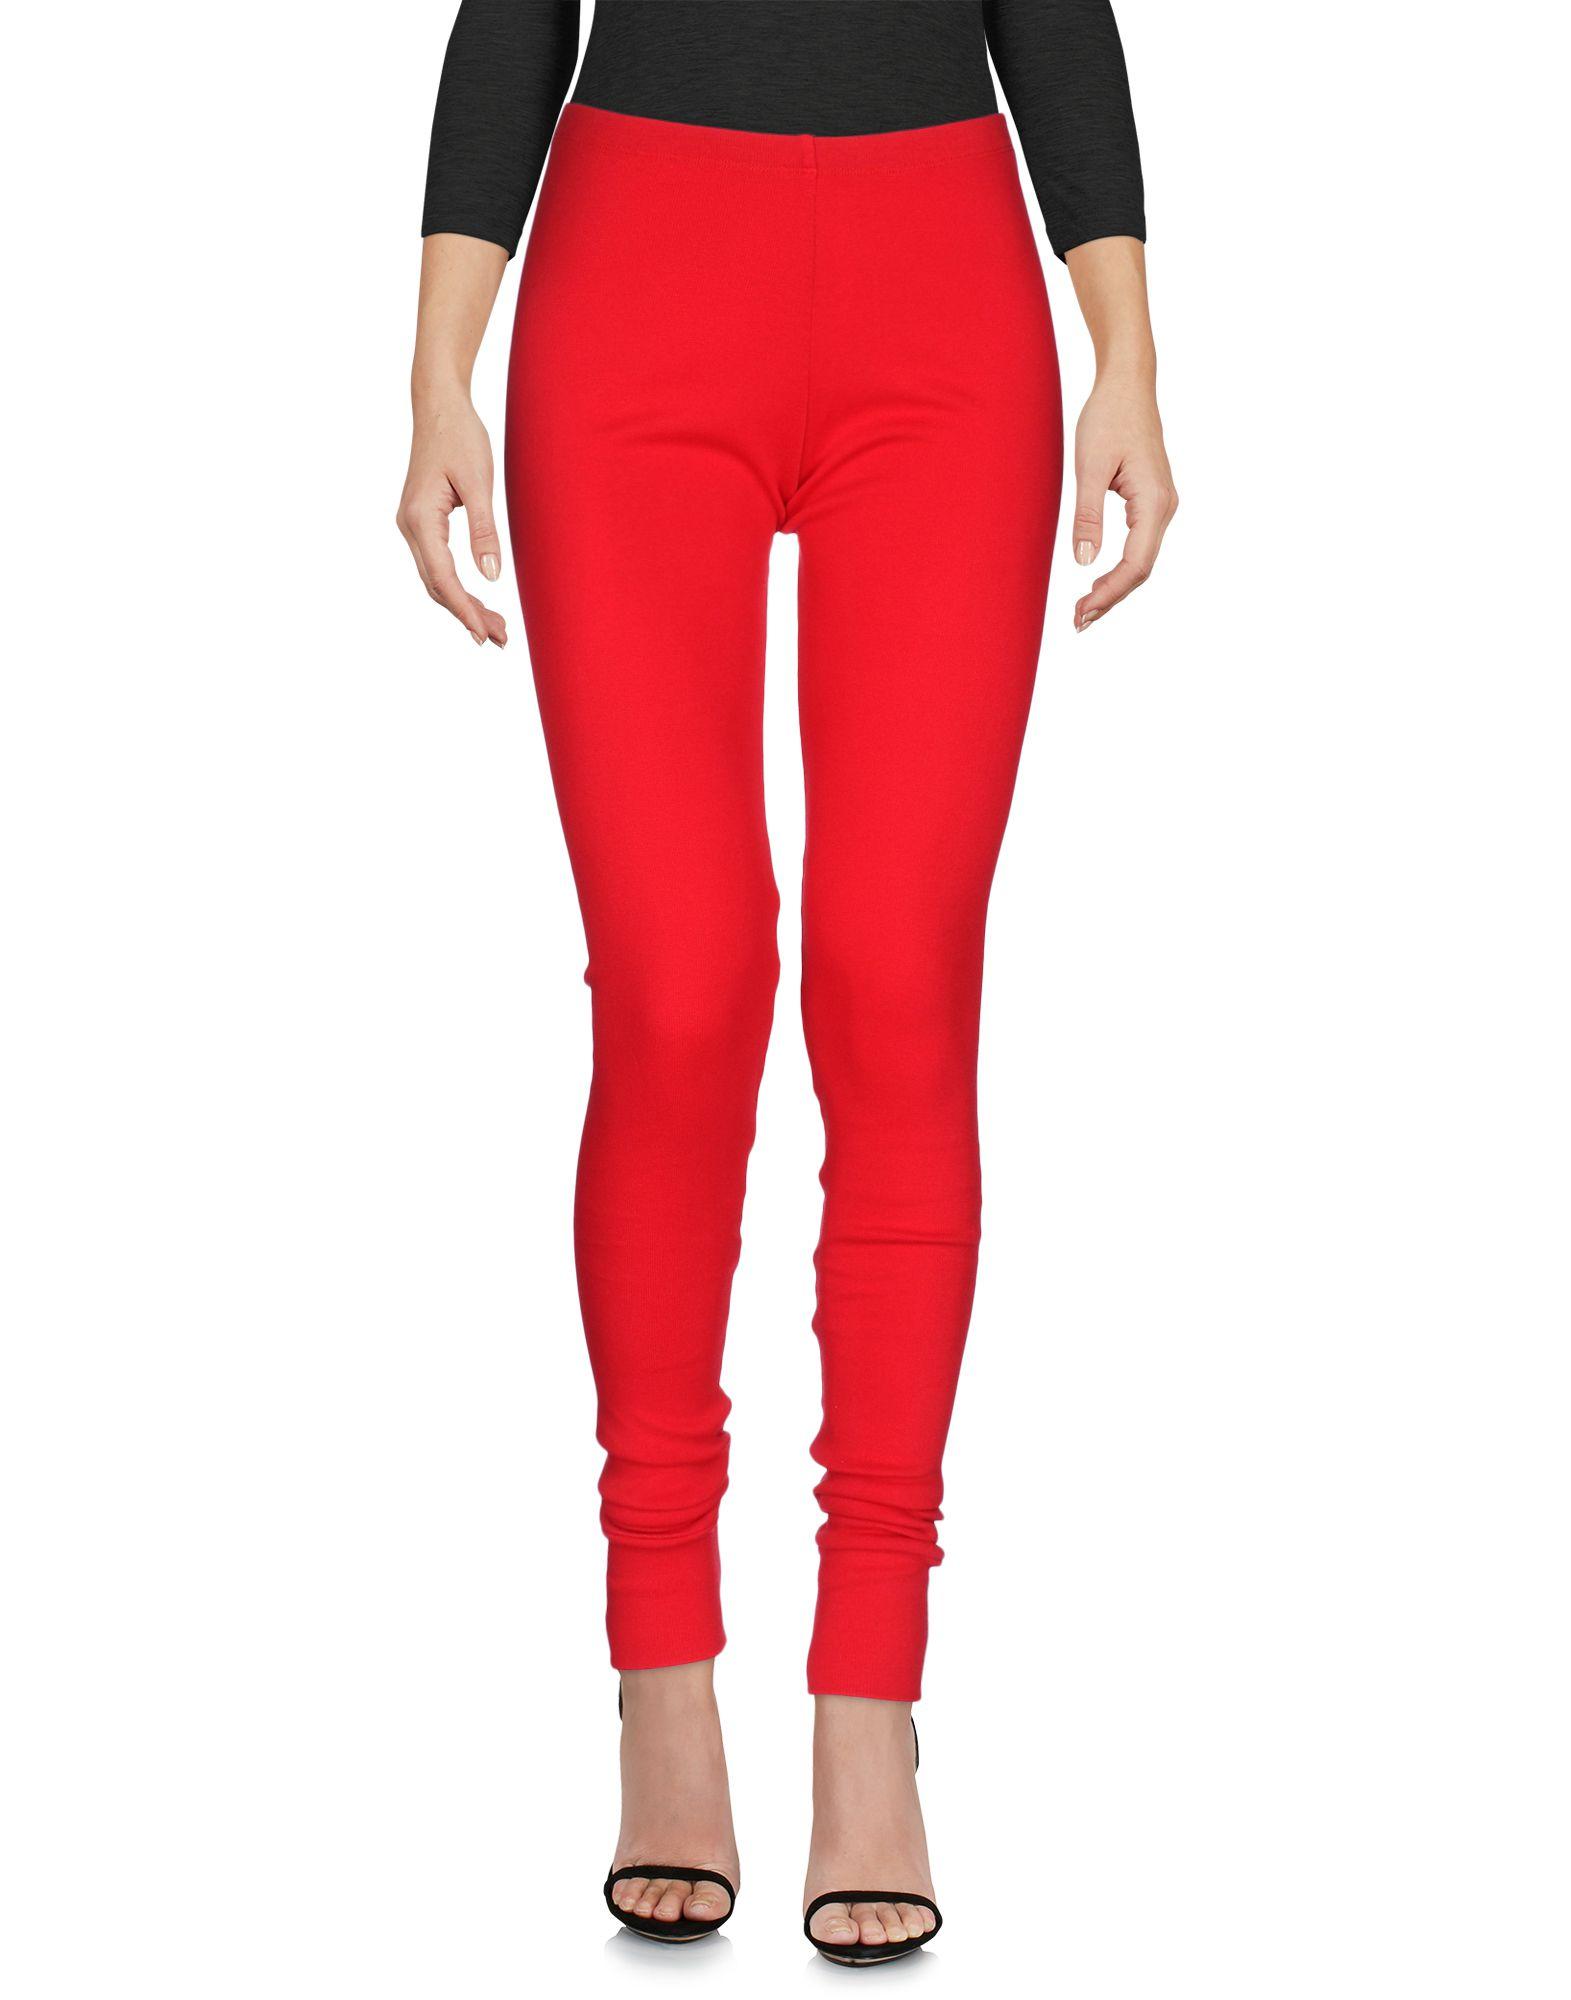 LUCIO VANOTTI Damen Leggings Farbe Rot Größe 5 jetztbilligerkaufen